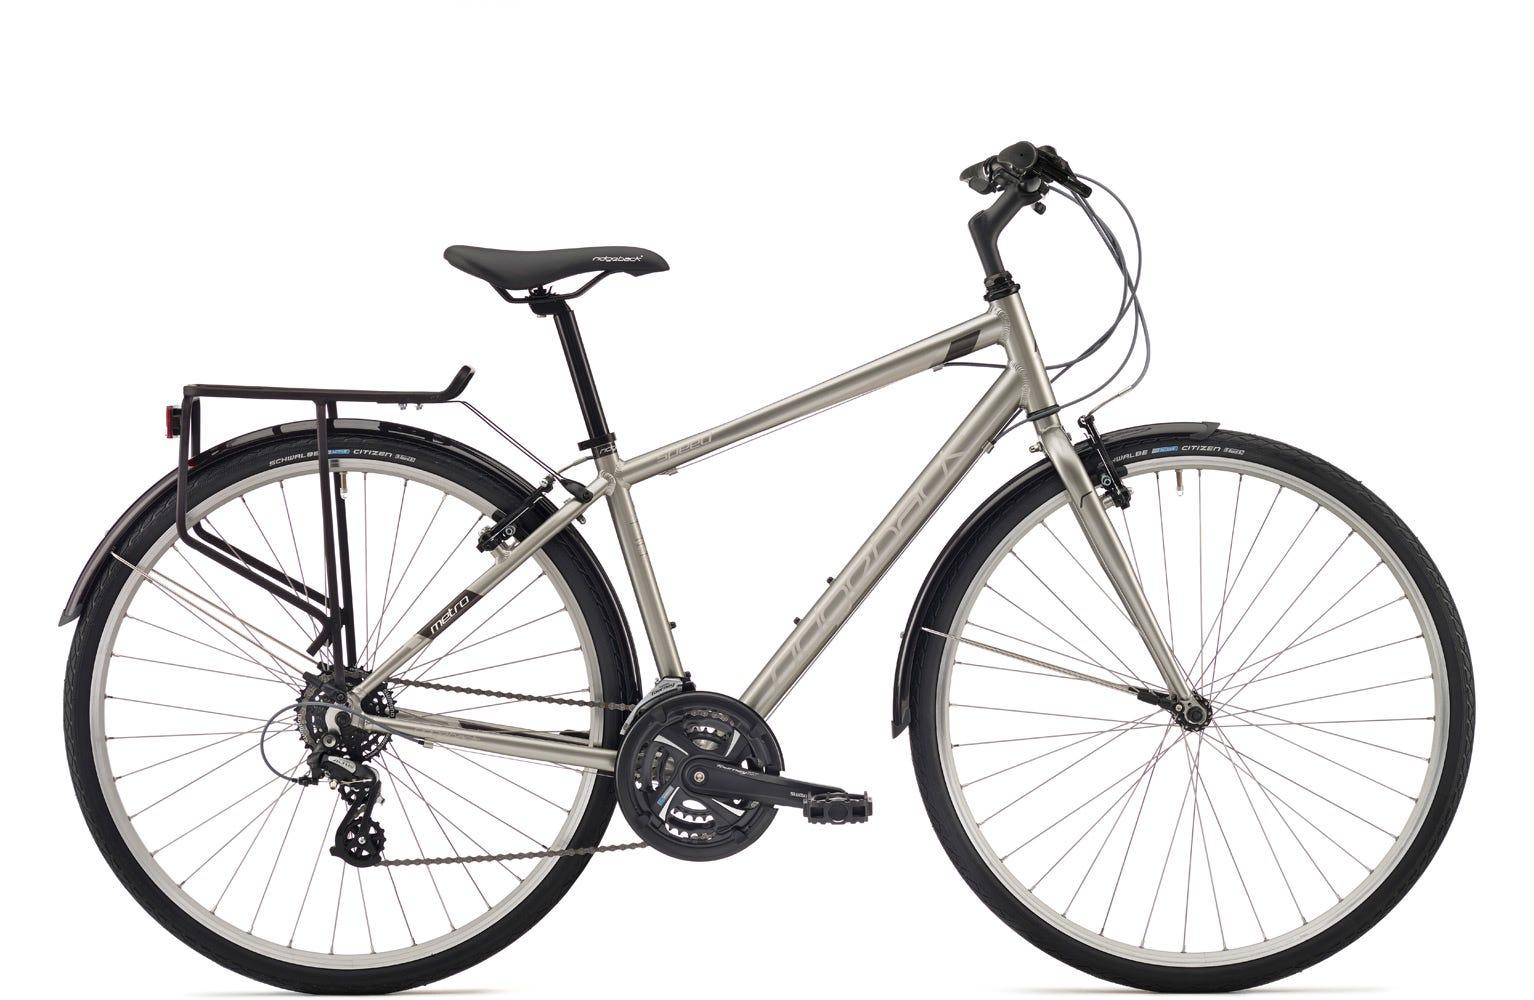 Ridgeback Speed 19 inch bike silver Ex Display